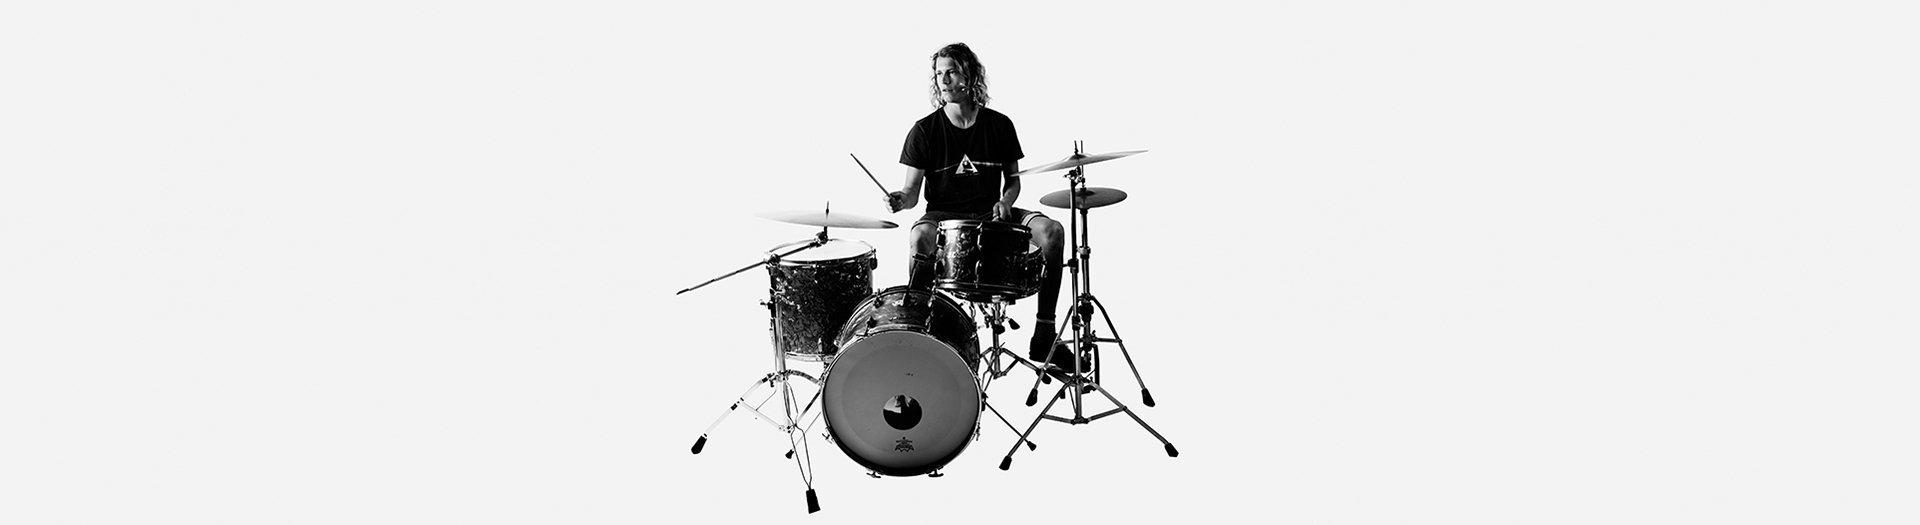 305 Musik — Photo Morten Rygaard All copyrights